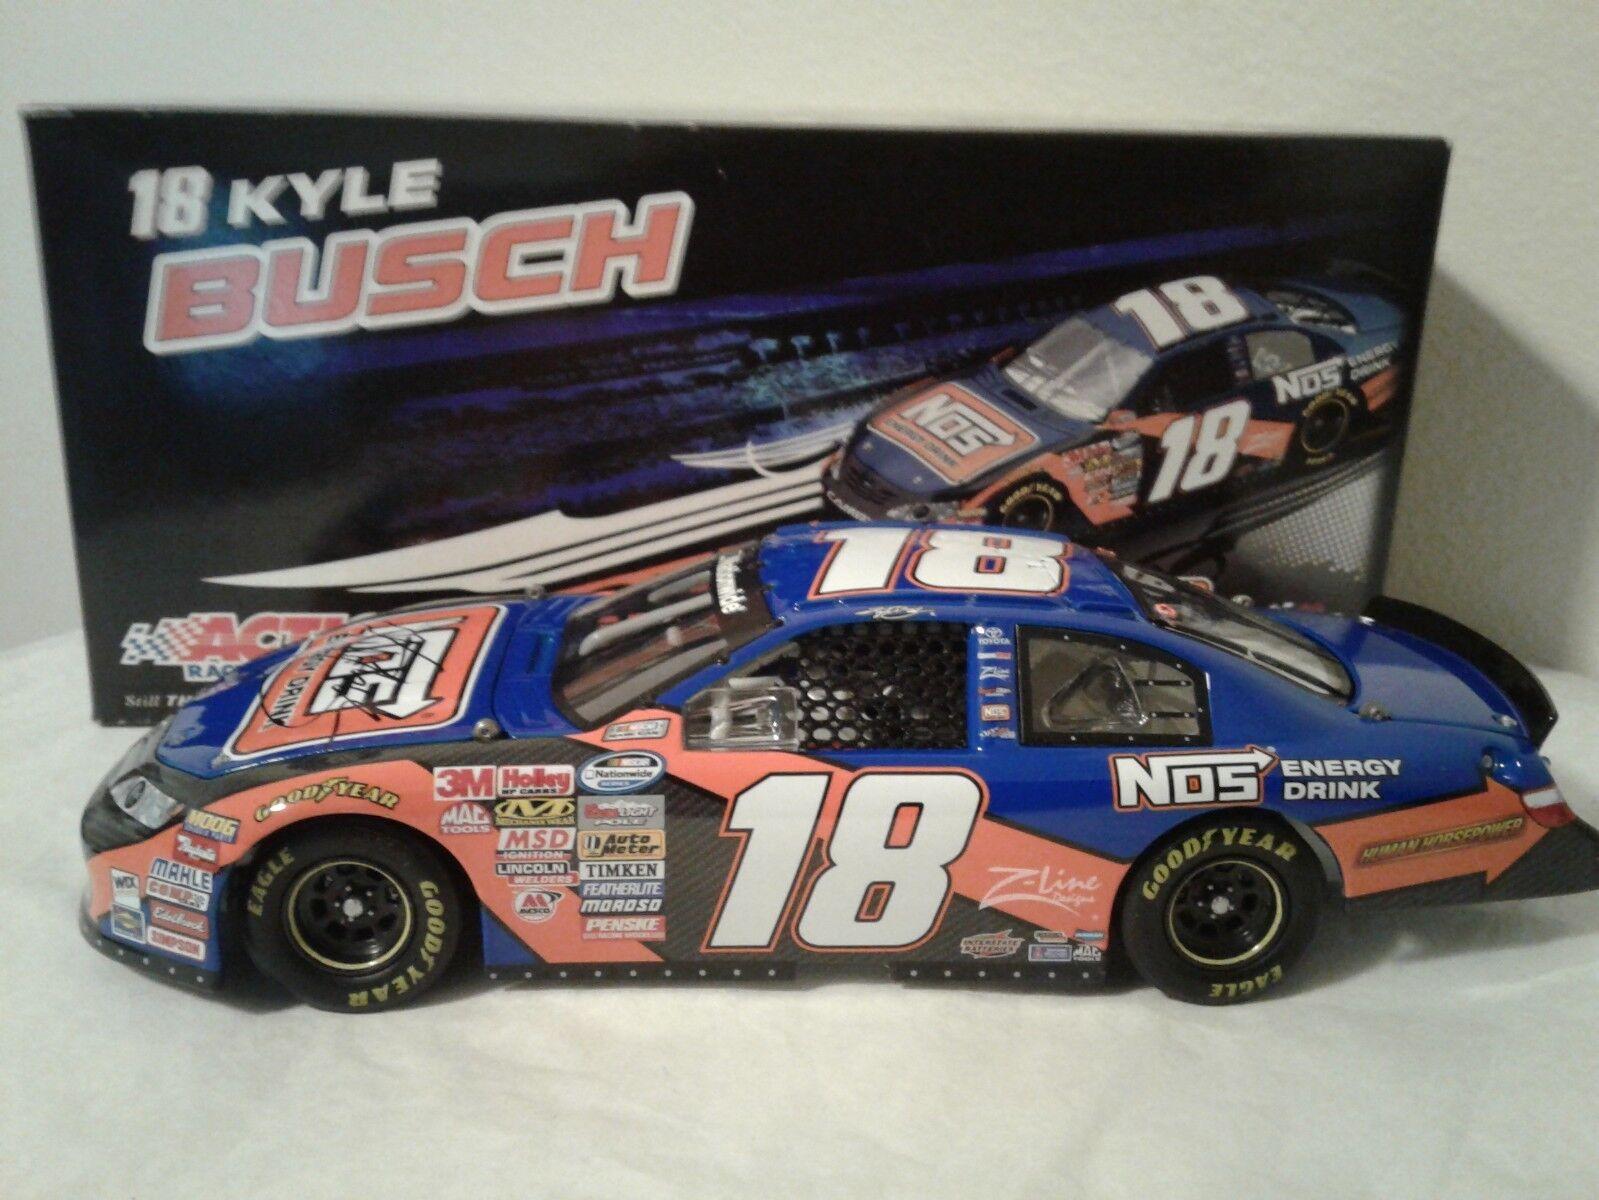 Kyle Busch Autograph 2009  18 NOS  Energy Drink  Camry 1 24 Joe Gibbs Racing